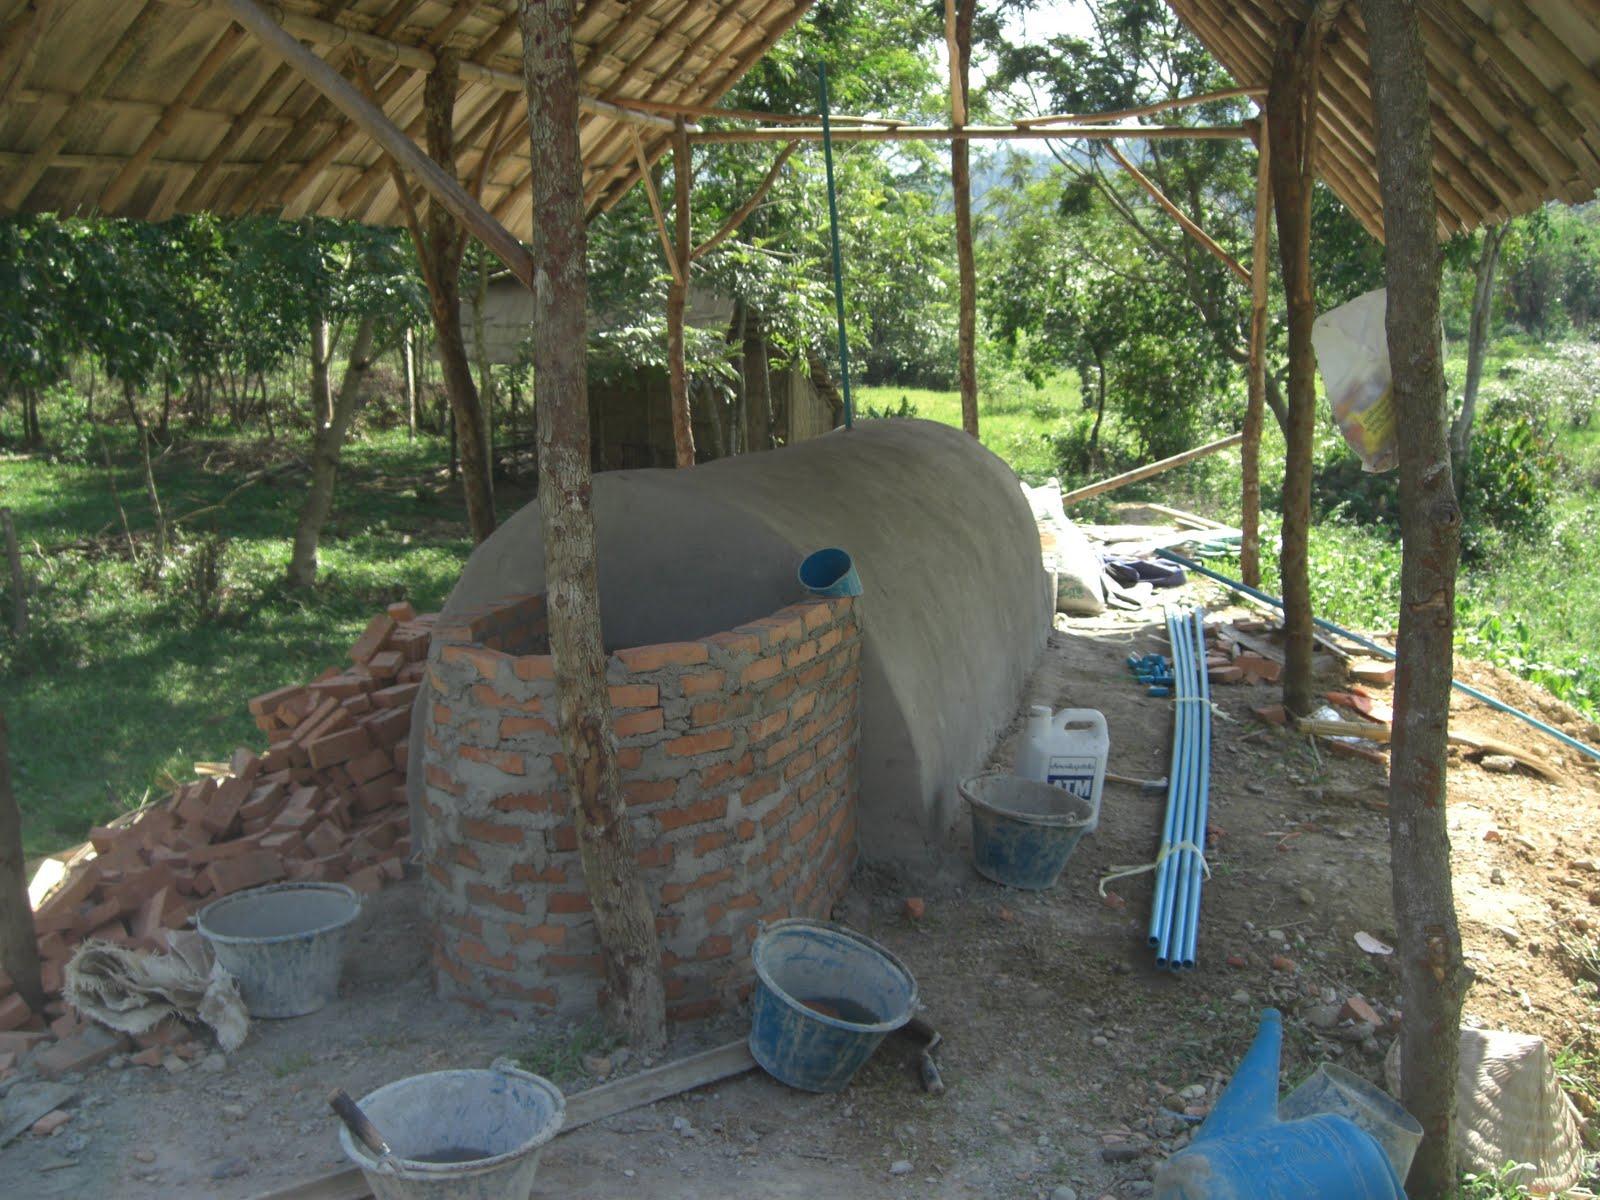 Clay and brick biogas fermentor built at SAELAO sustainable community near Vang Vieng, Laos